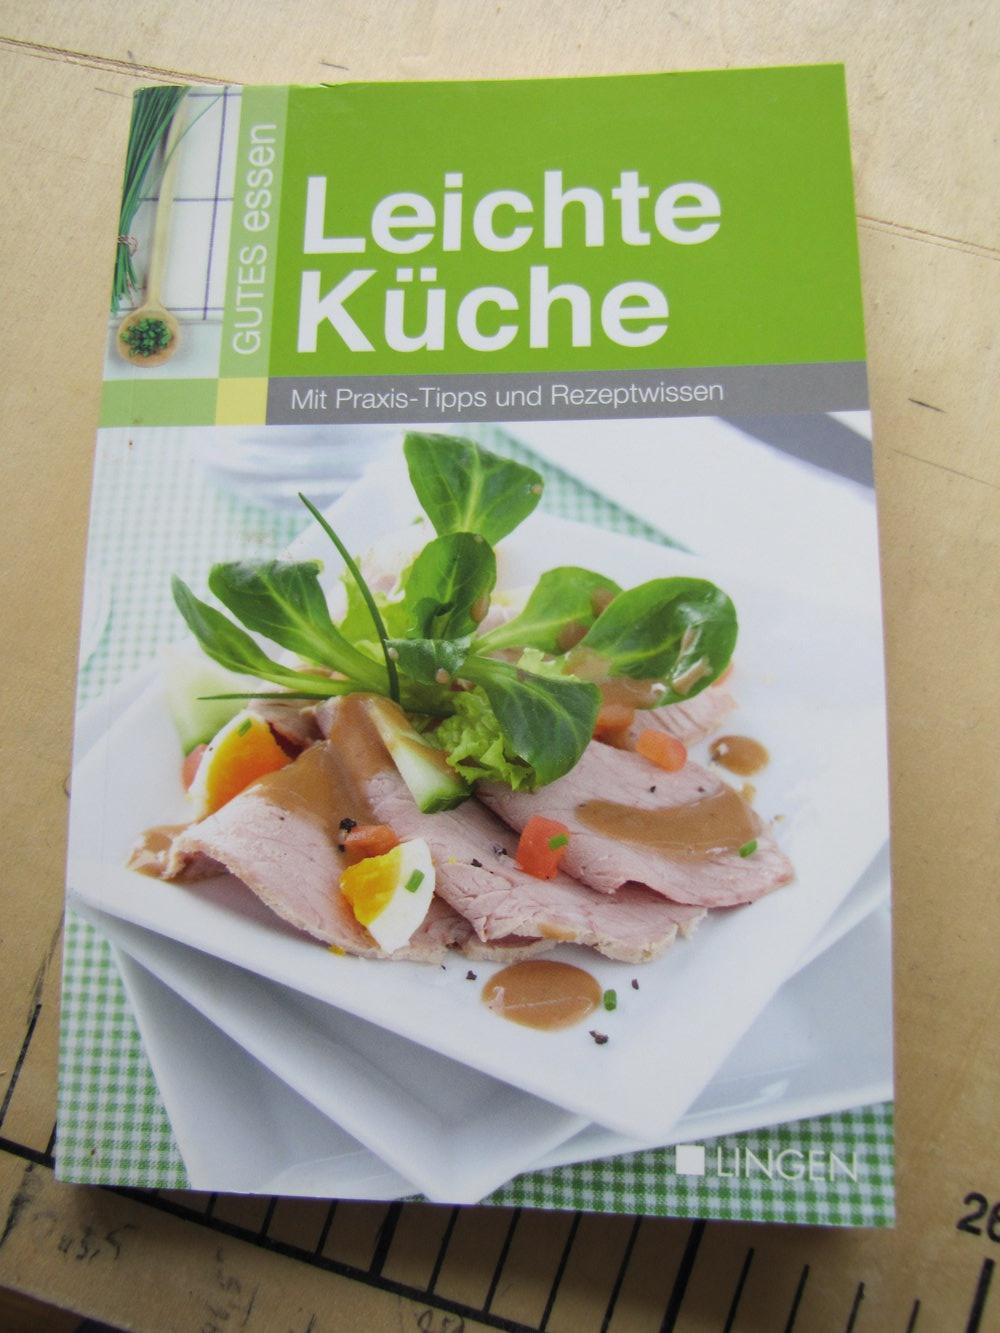 Emejing Ayurveda Küche Rezepte Gallery - Ridgewayng.com ...